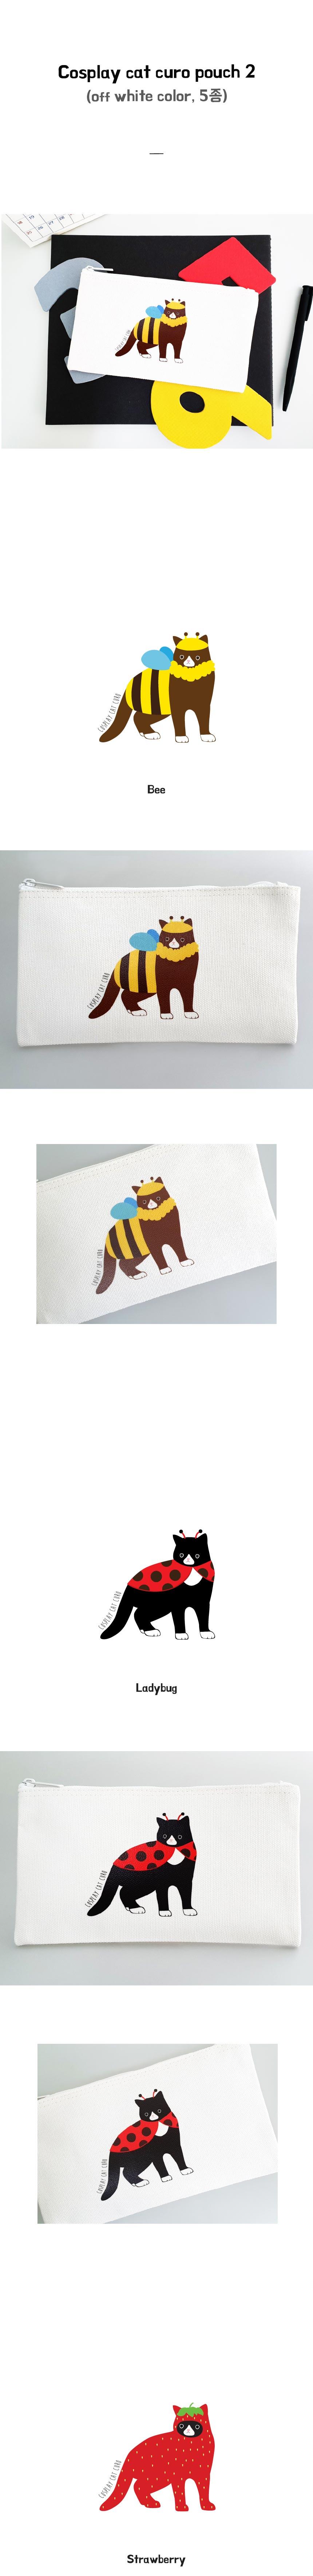 Cosplay cat curo pouch 2 (5종) - 유이마루, 8,000원, 다용도파우치, 지퍼형